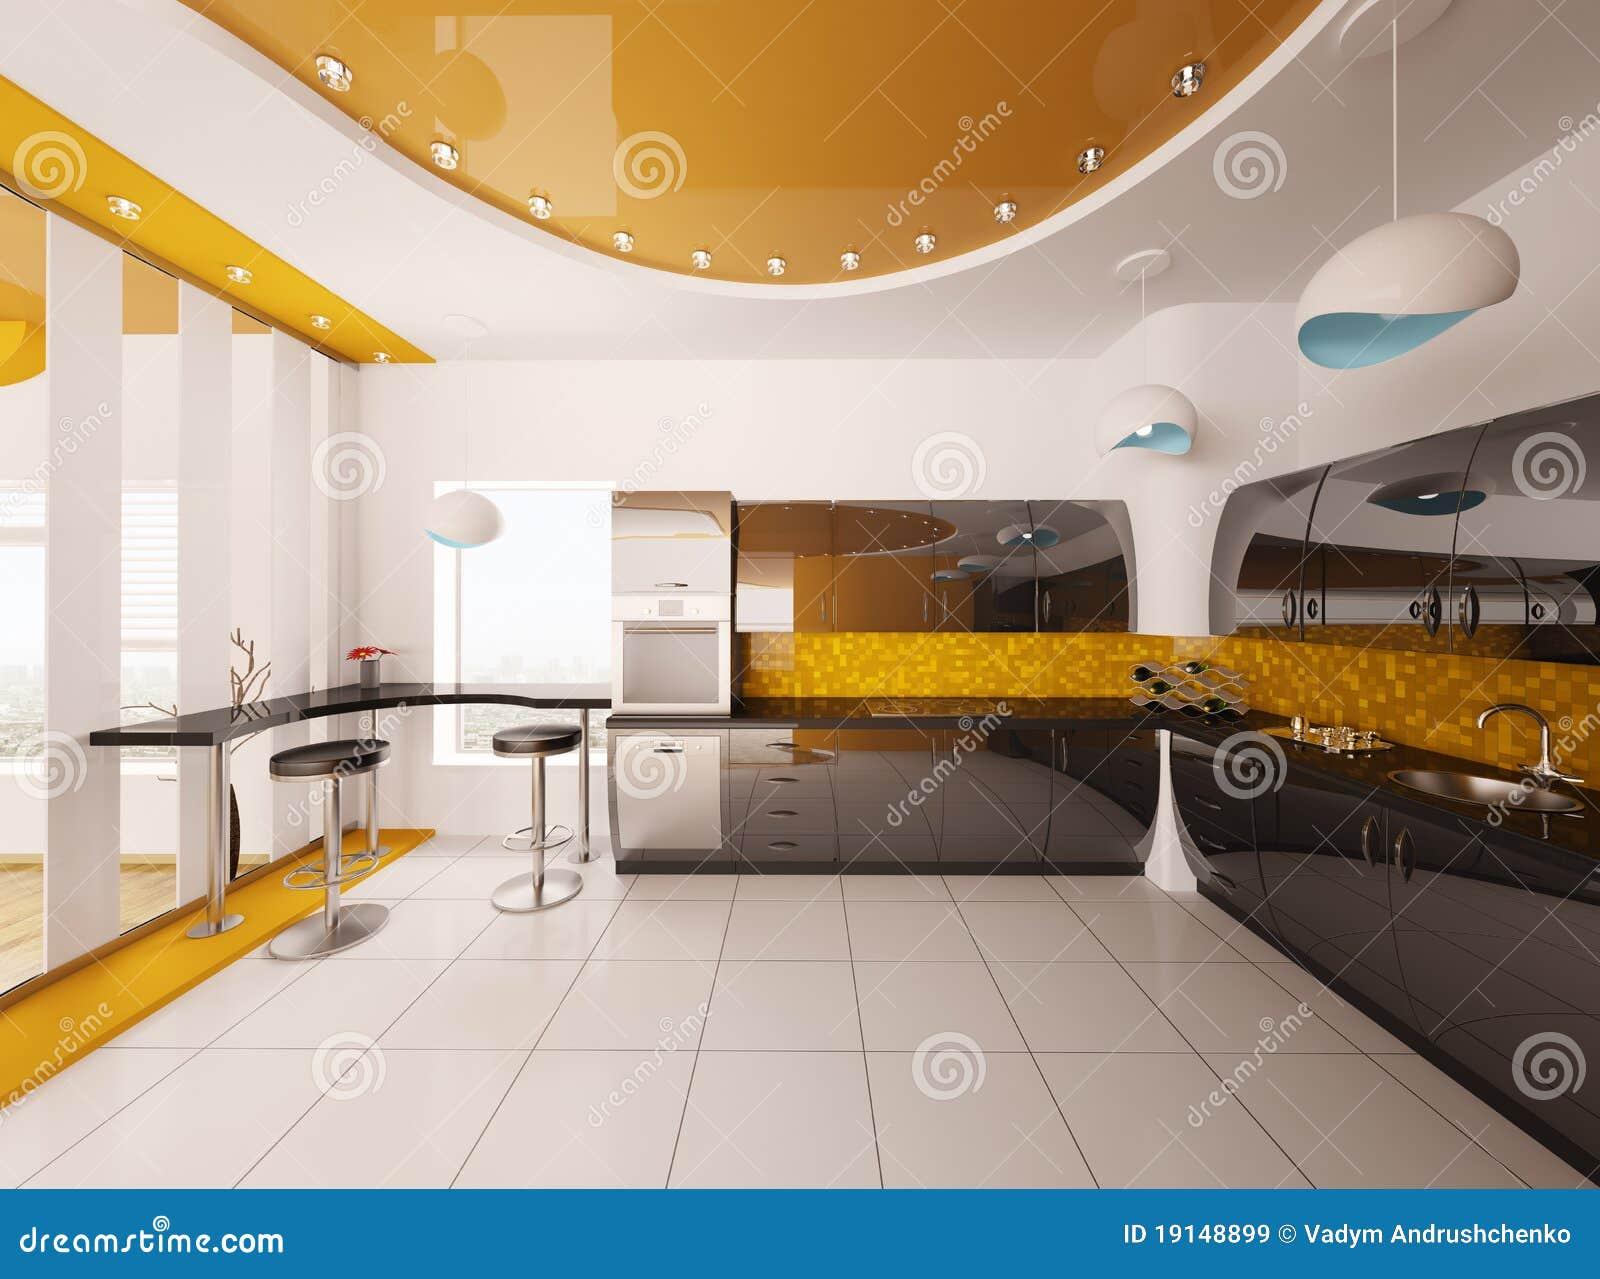 Voffca.com  Decorazione Isola Cucina